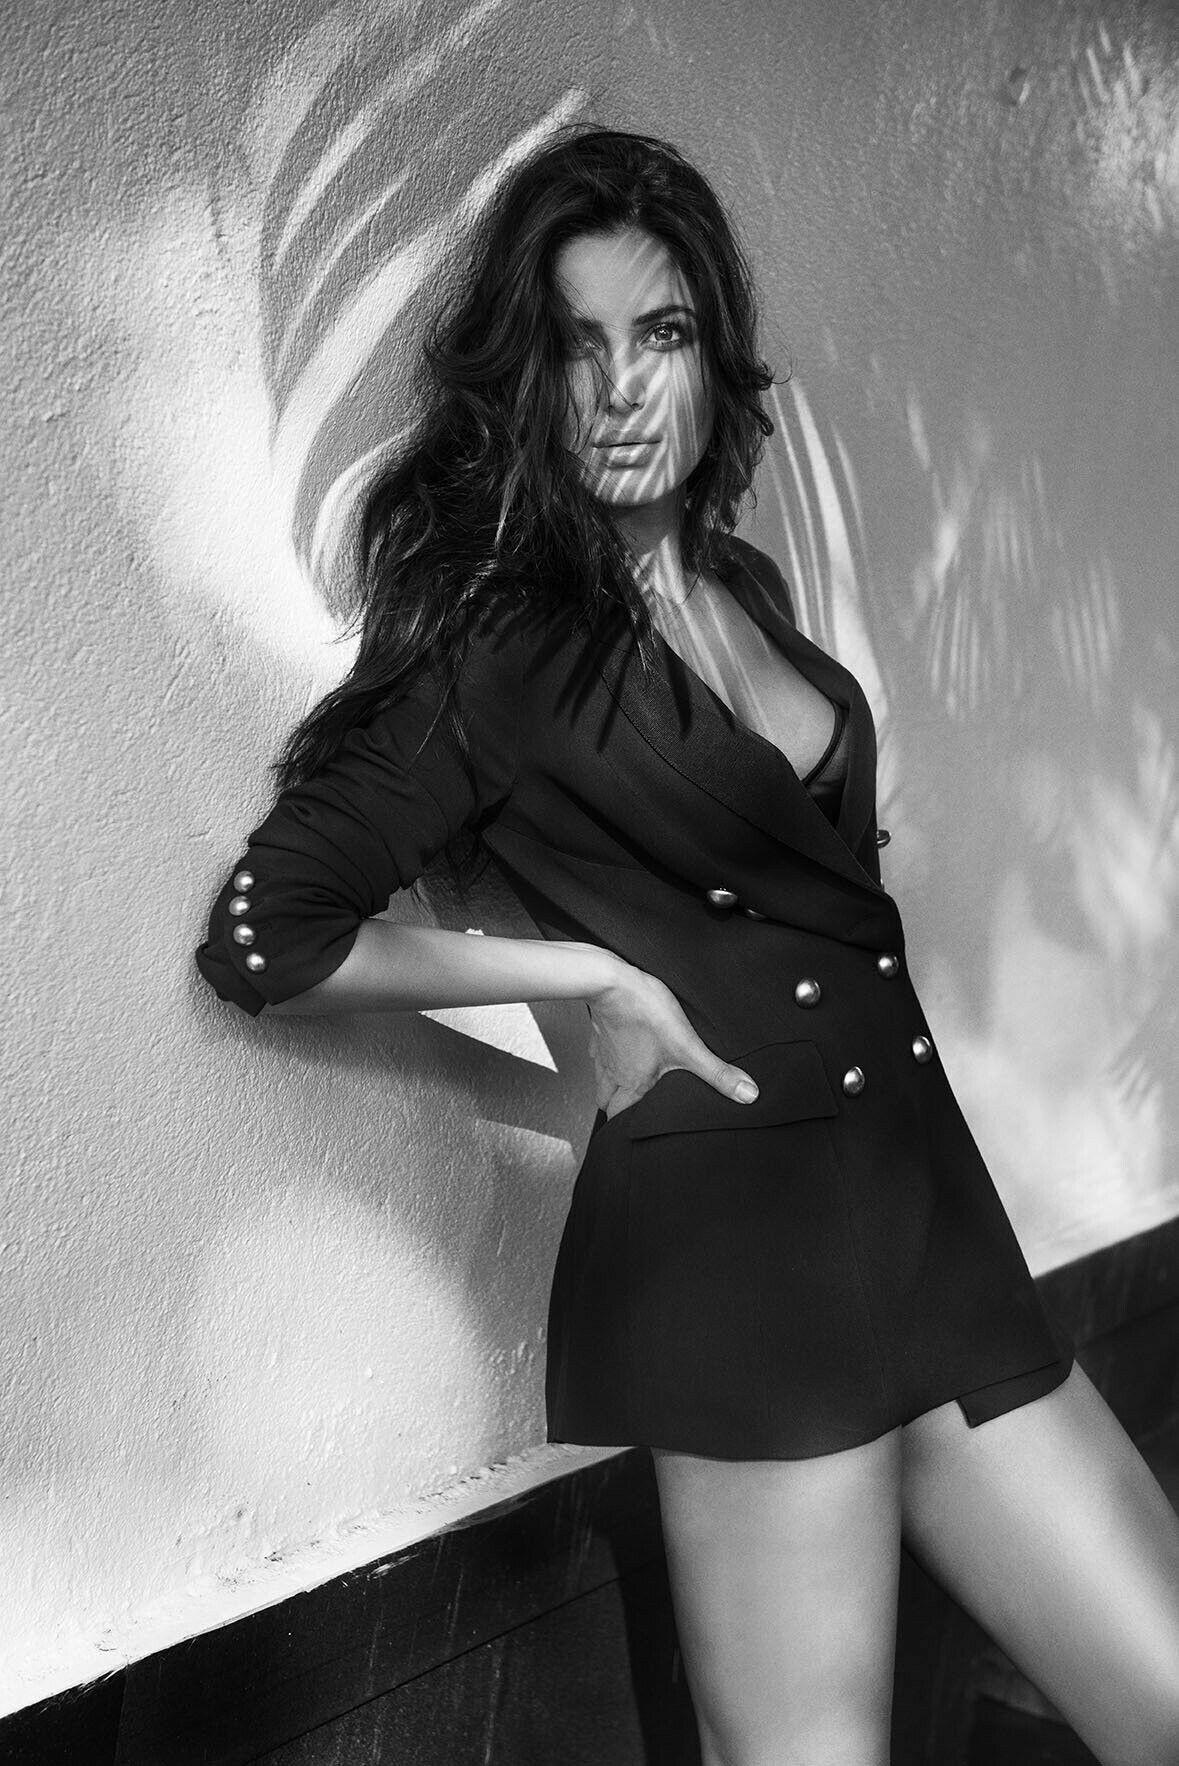 Holdem Celebrity: Katrina Kaif does a Salman khan